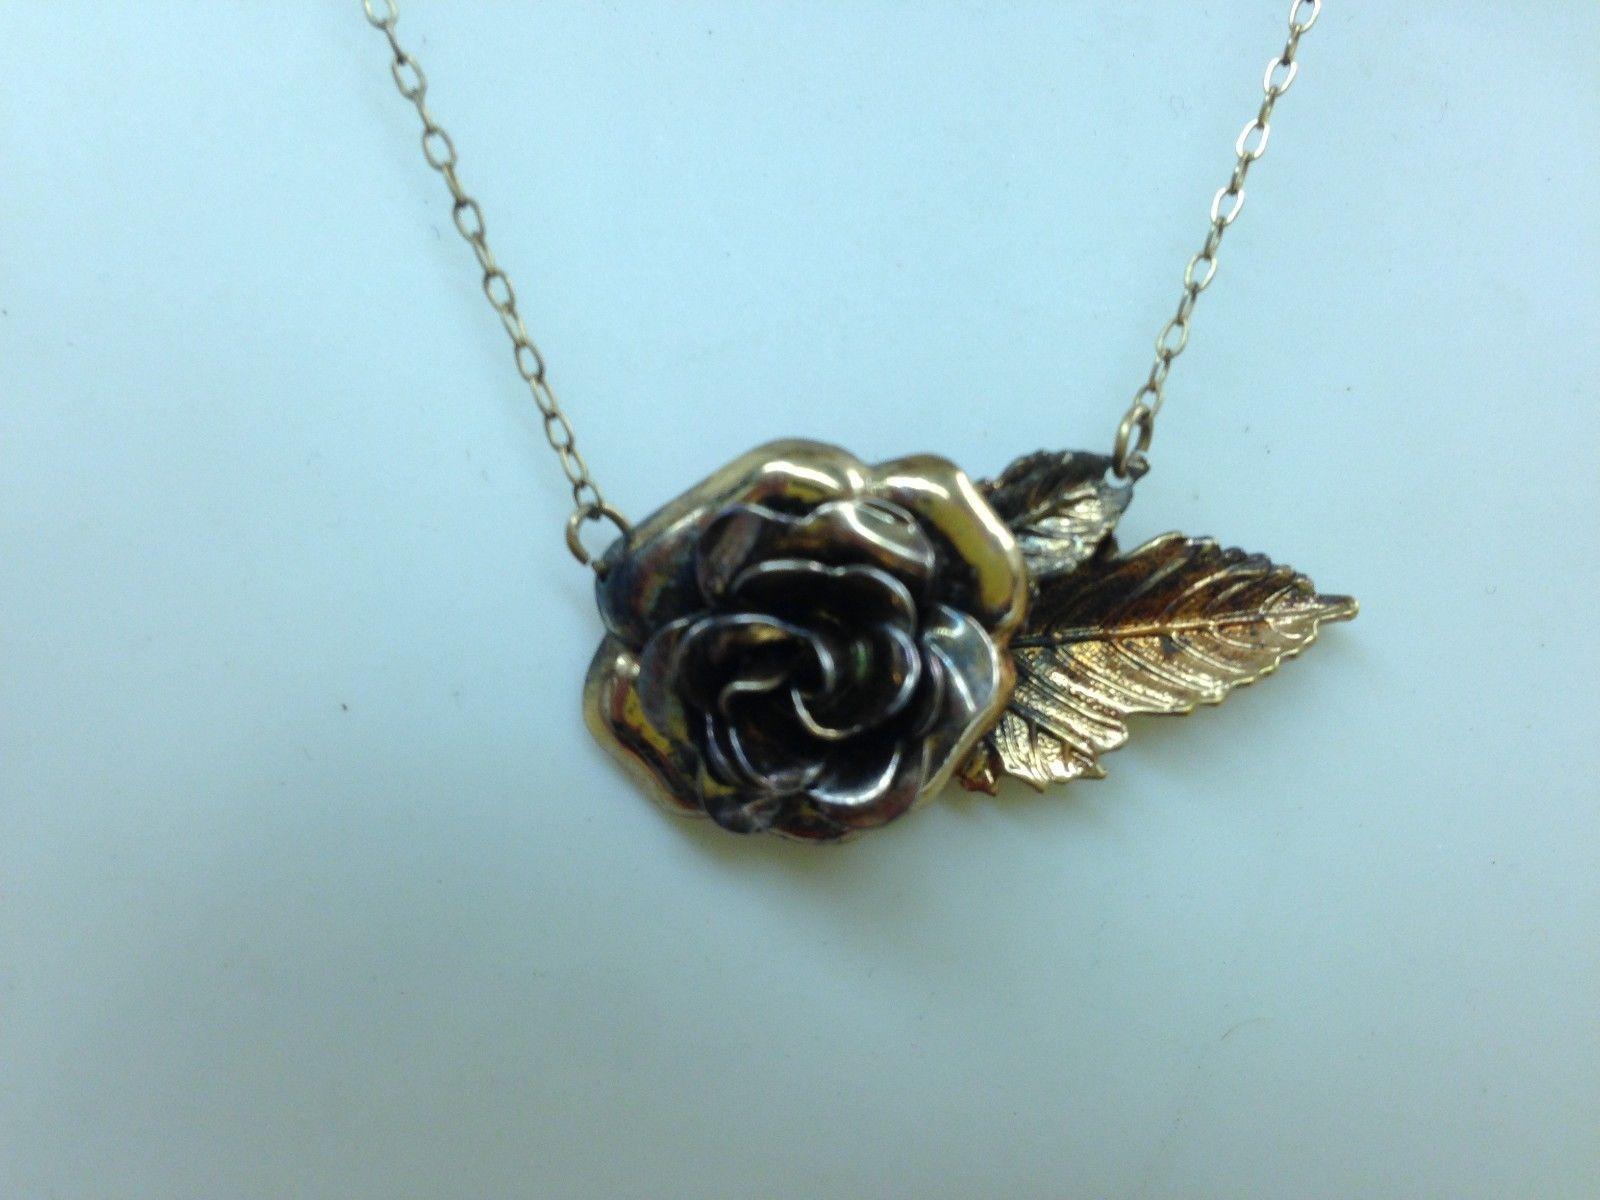 Vintage Vermeil Sterling Silver Flower Pendant on Chain